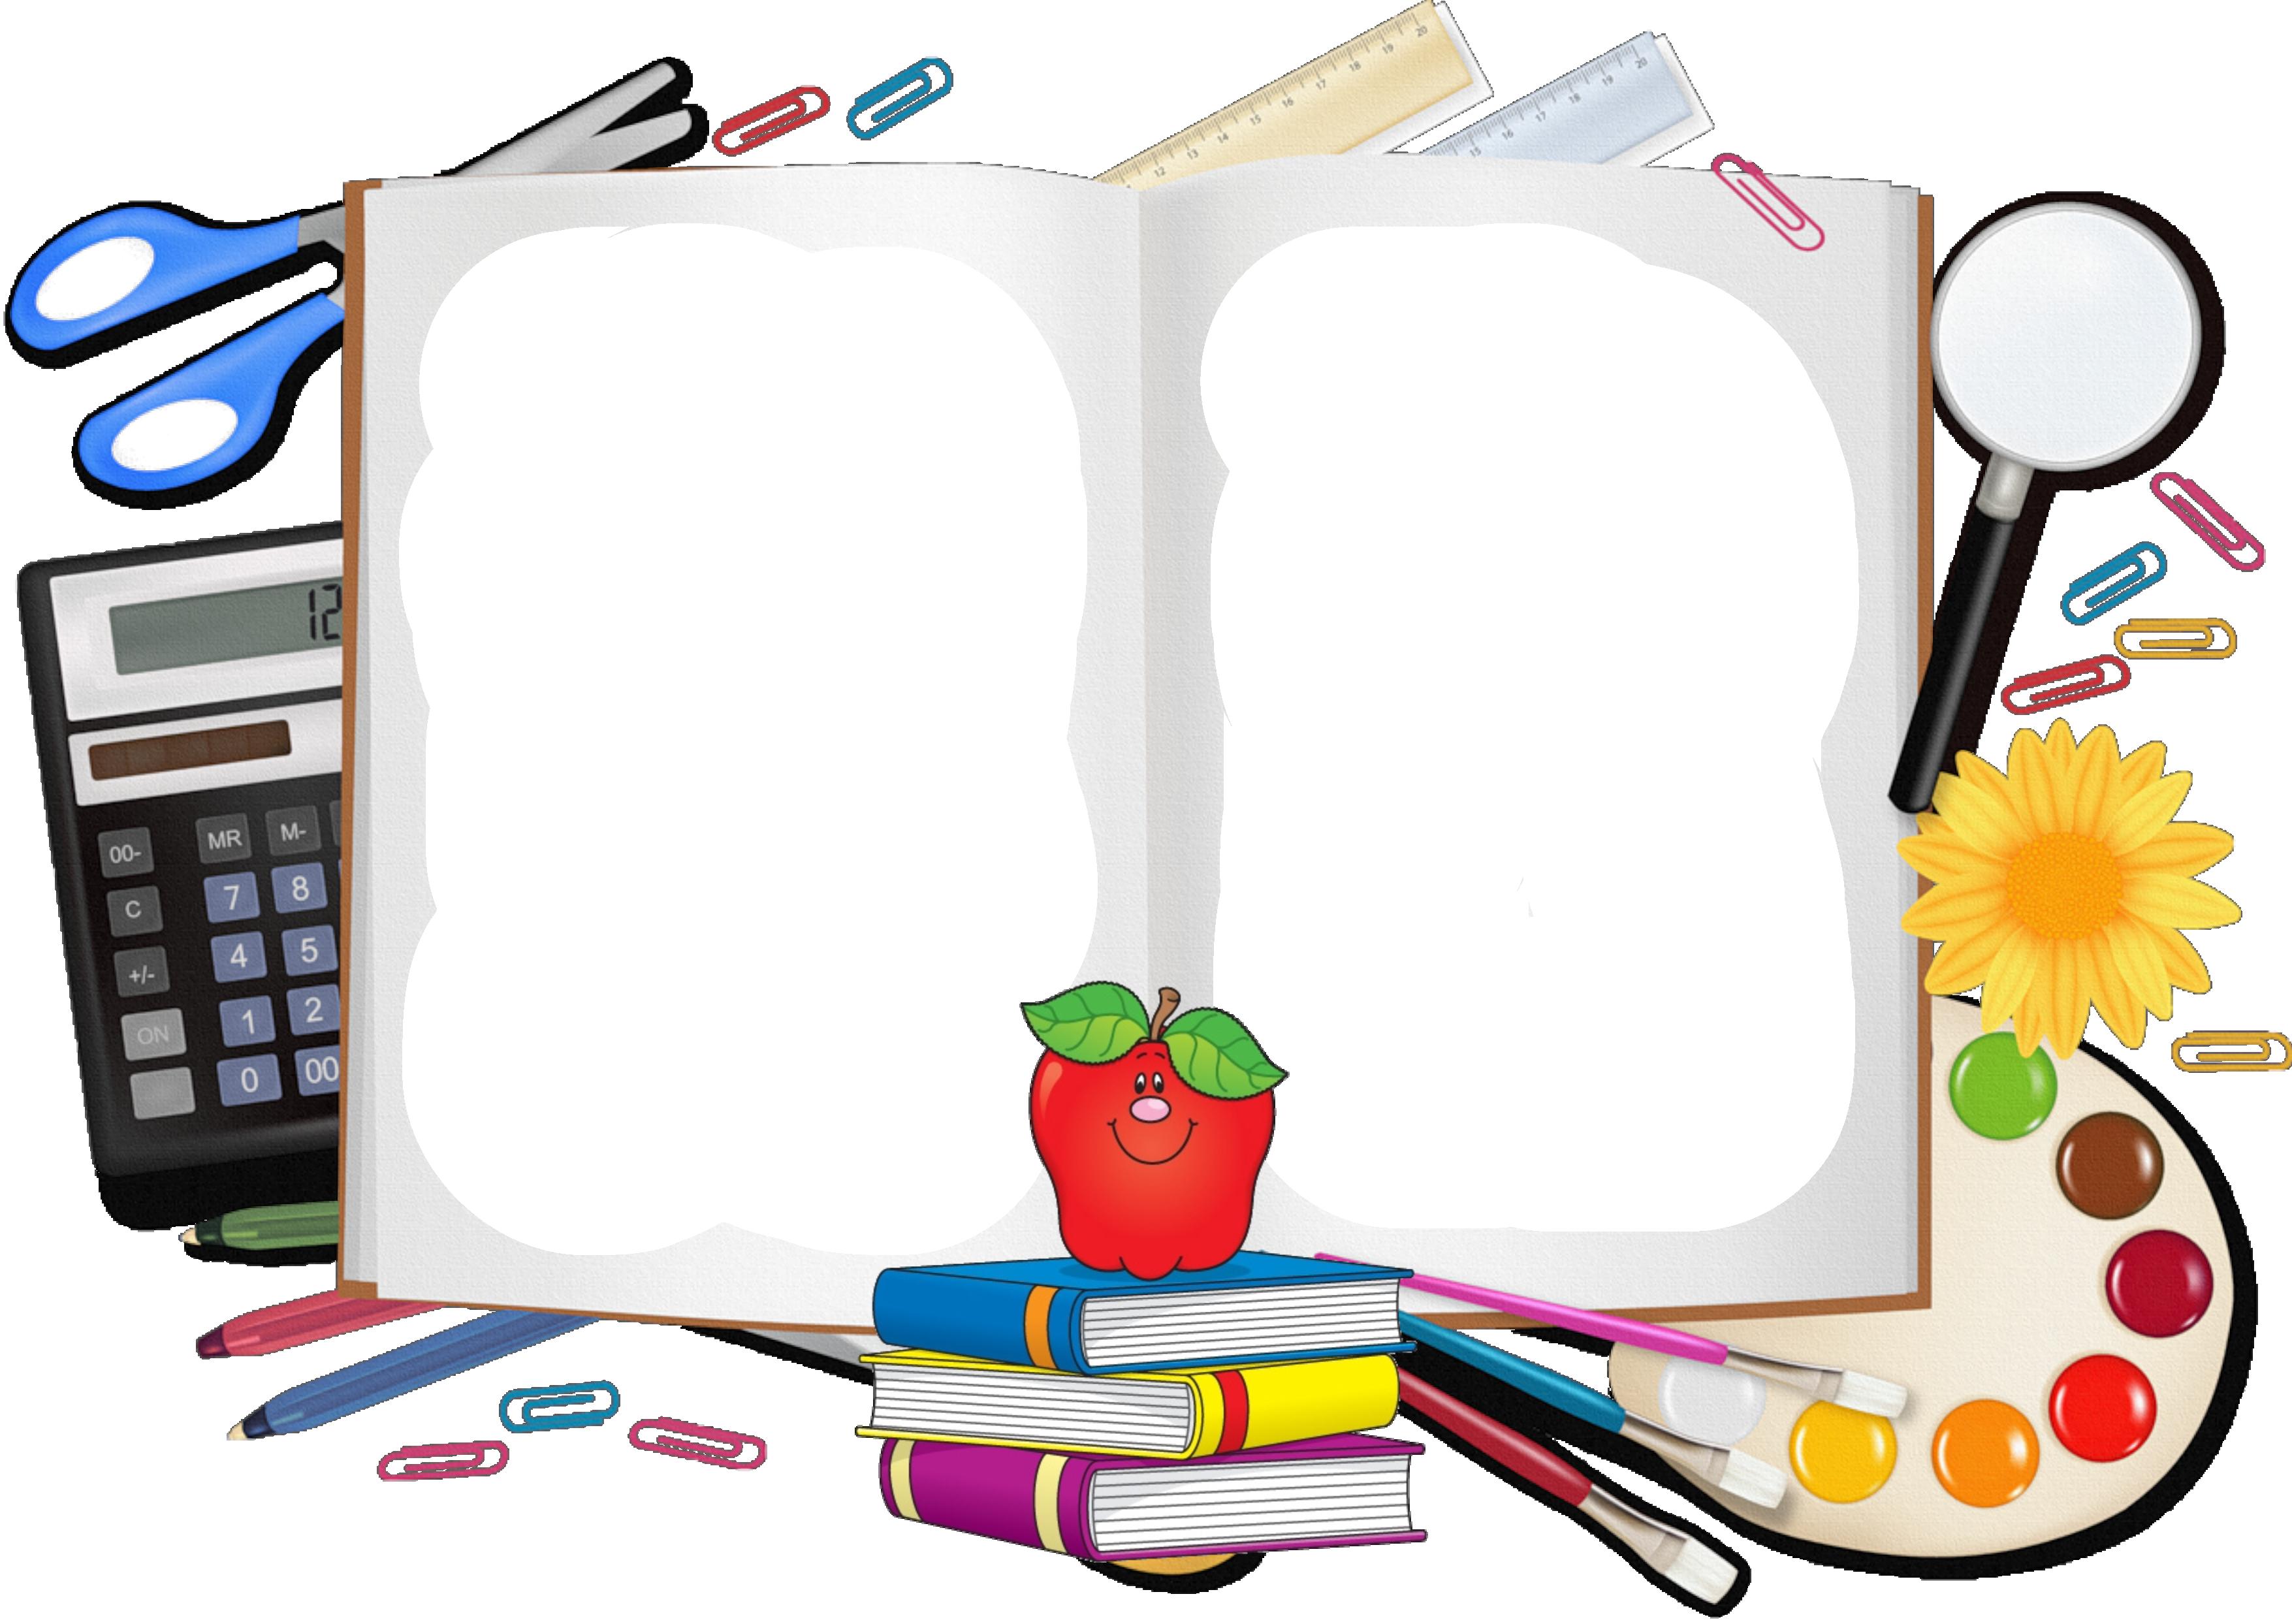 School supplies background clipart free School supplies cartoon images clipart images gallery for ... free